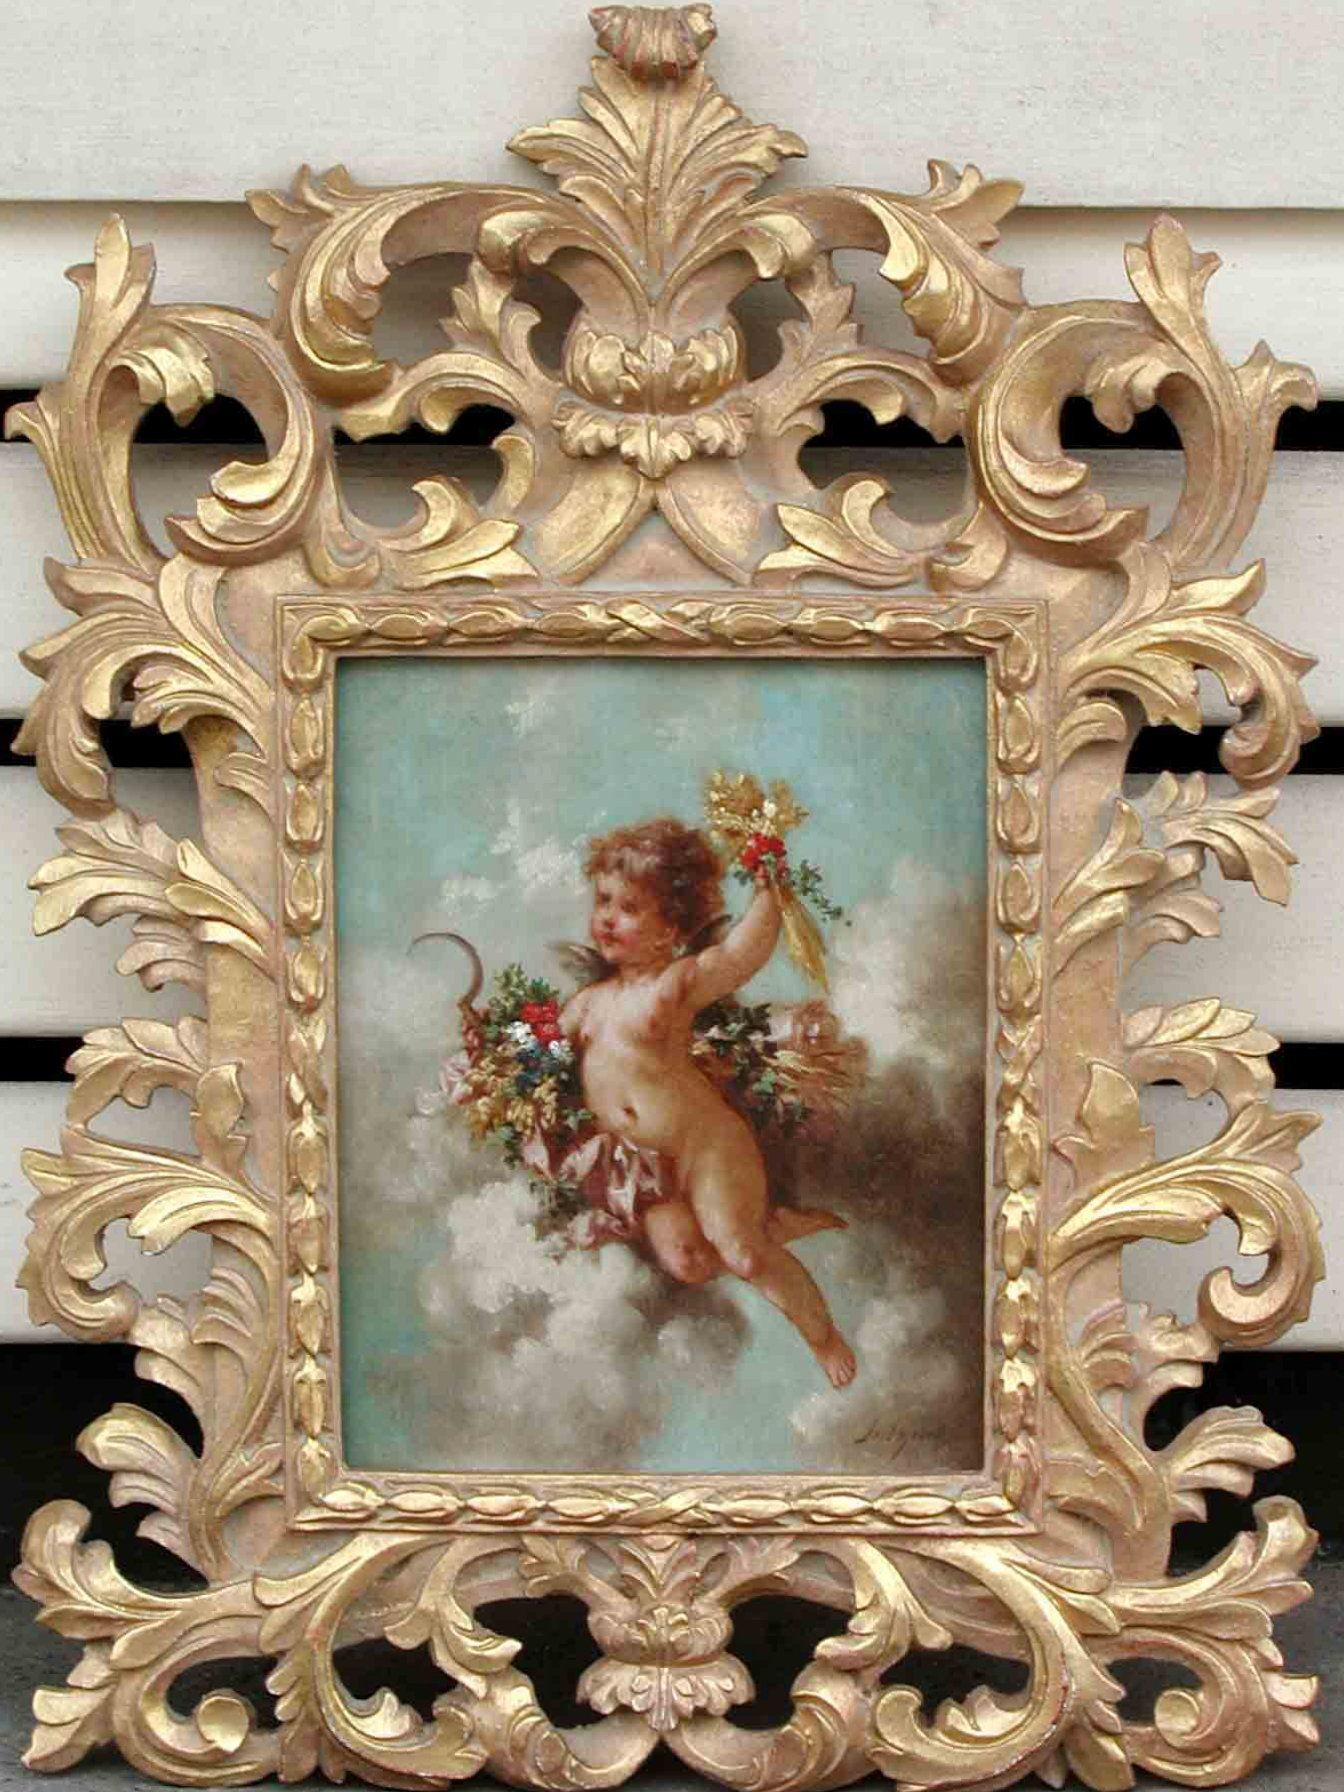 Pin by ROSY GUTIERREZ on Interior design | Antique mirror ...